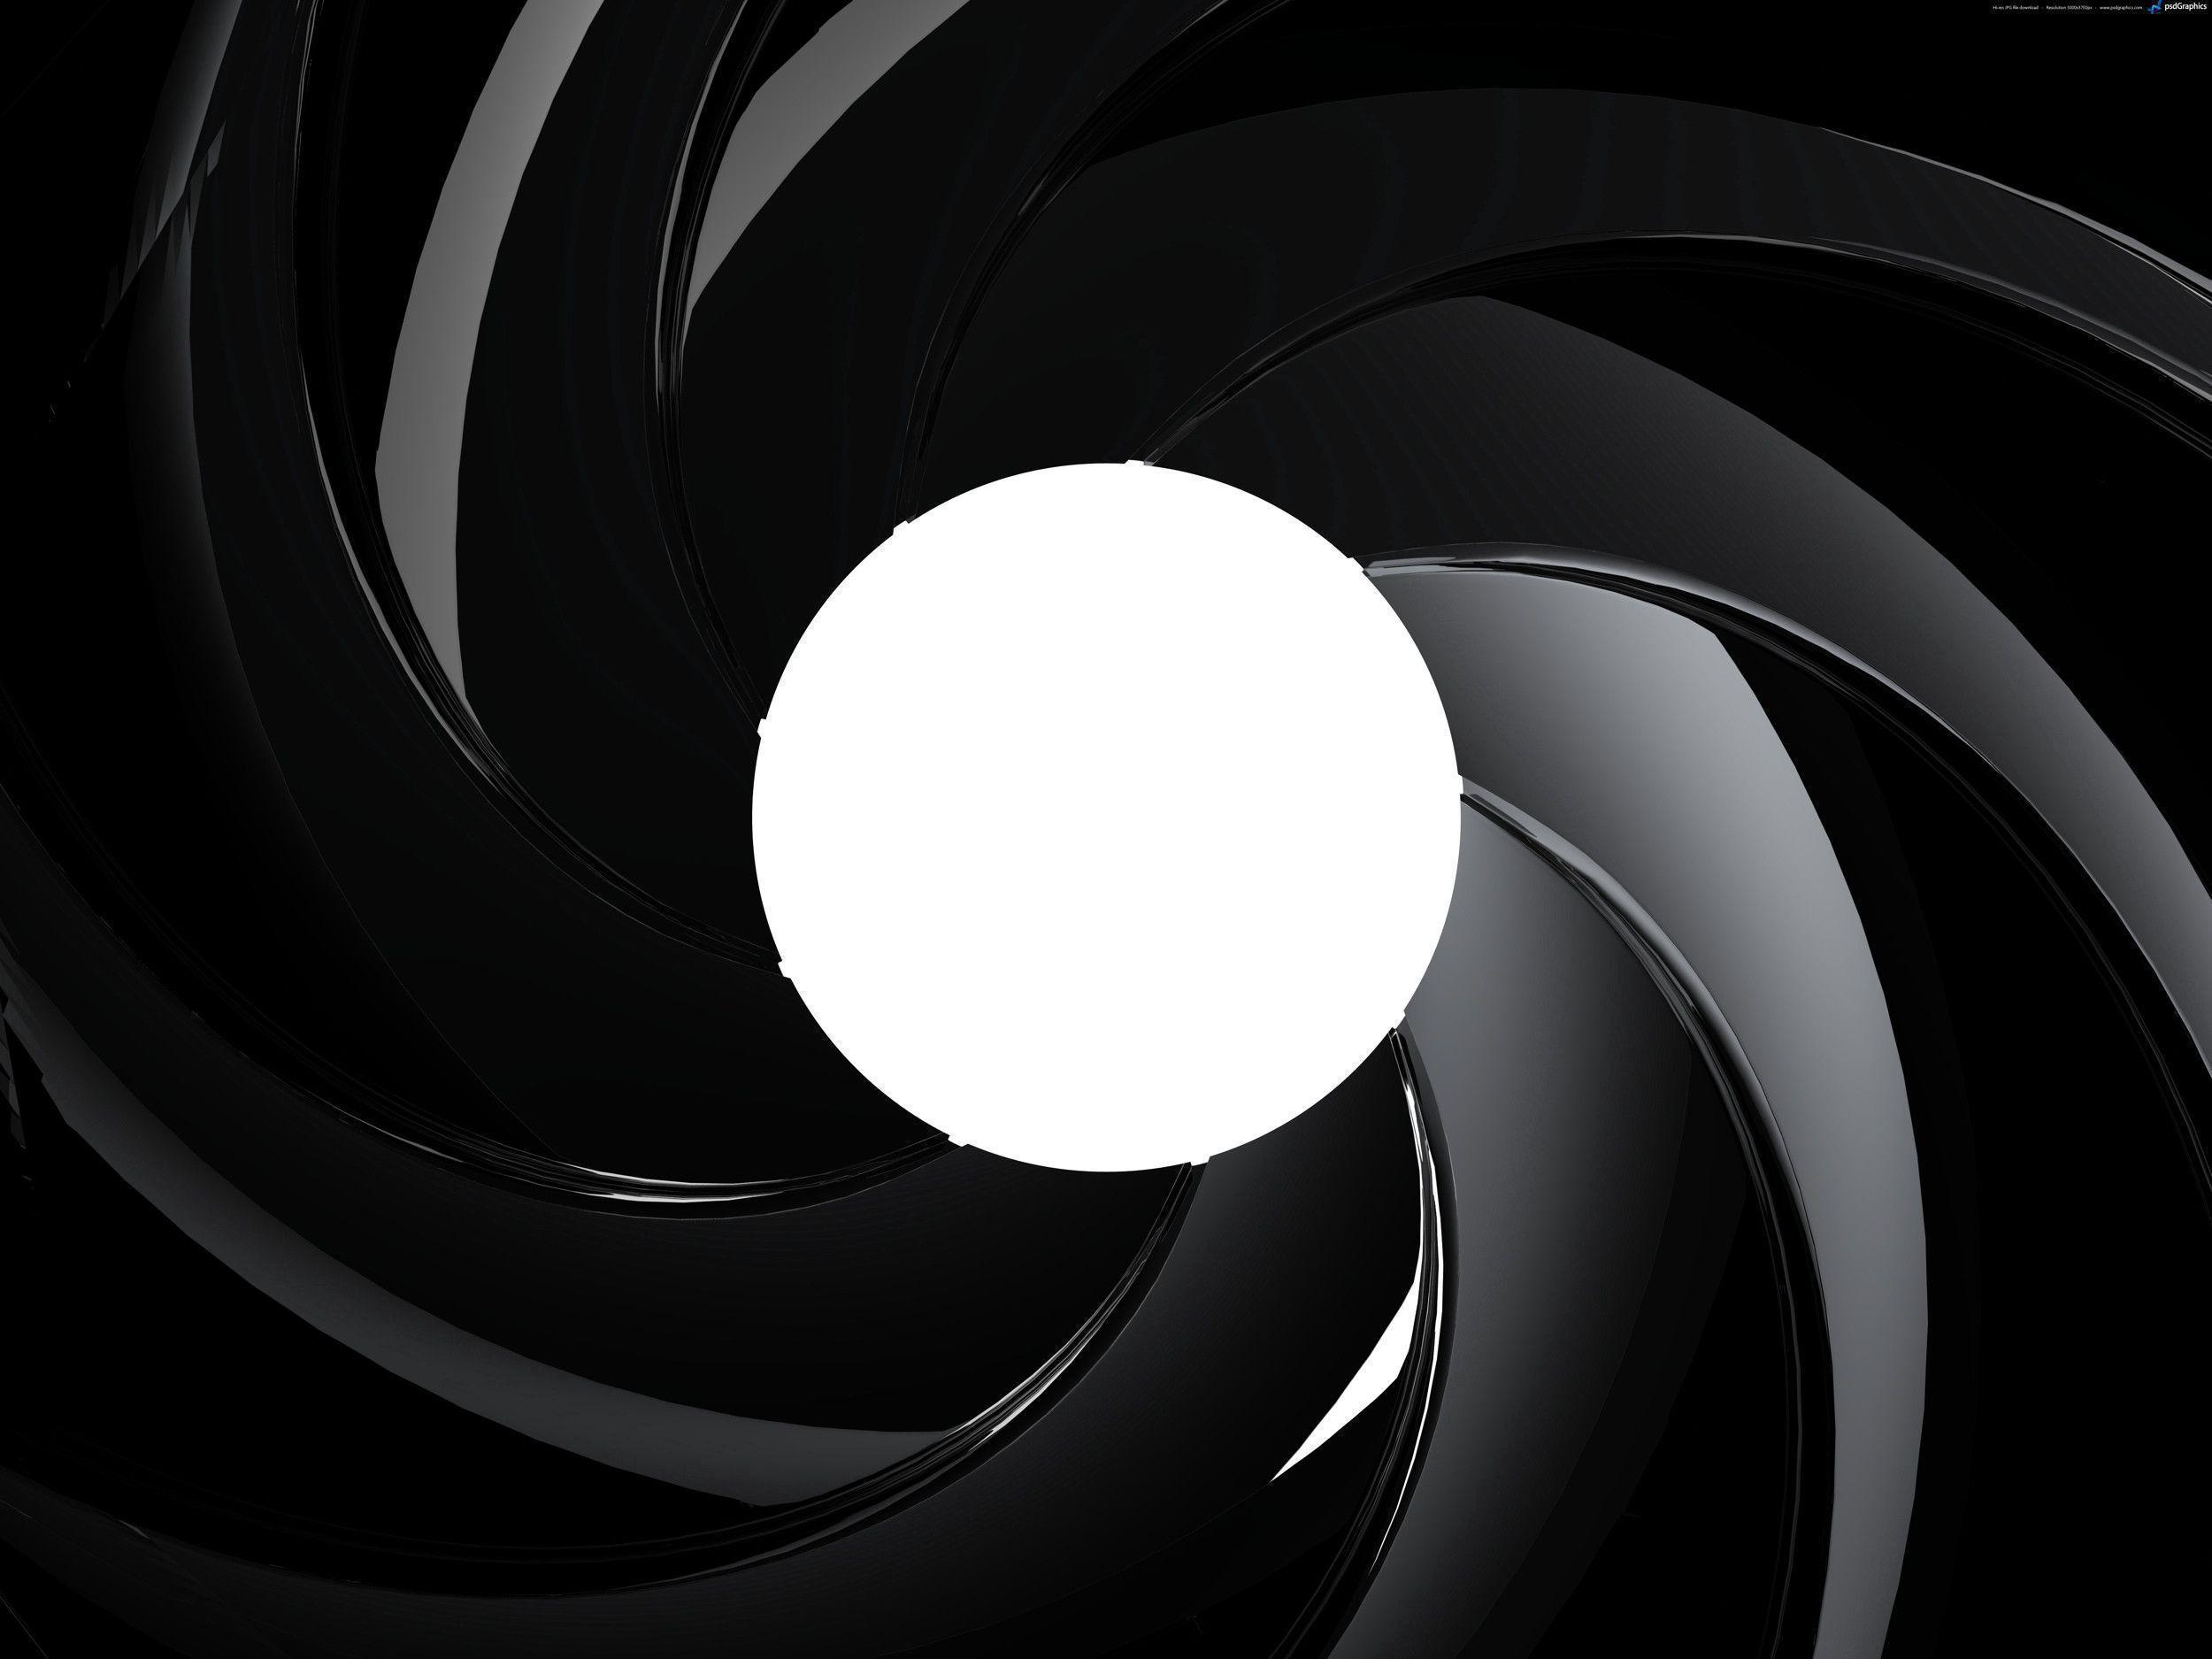 James Bond Wallpapers - Wallpaper Cave